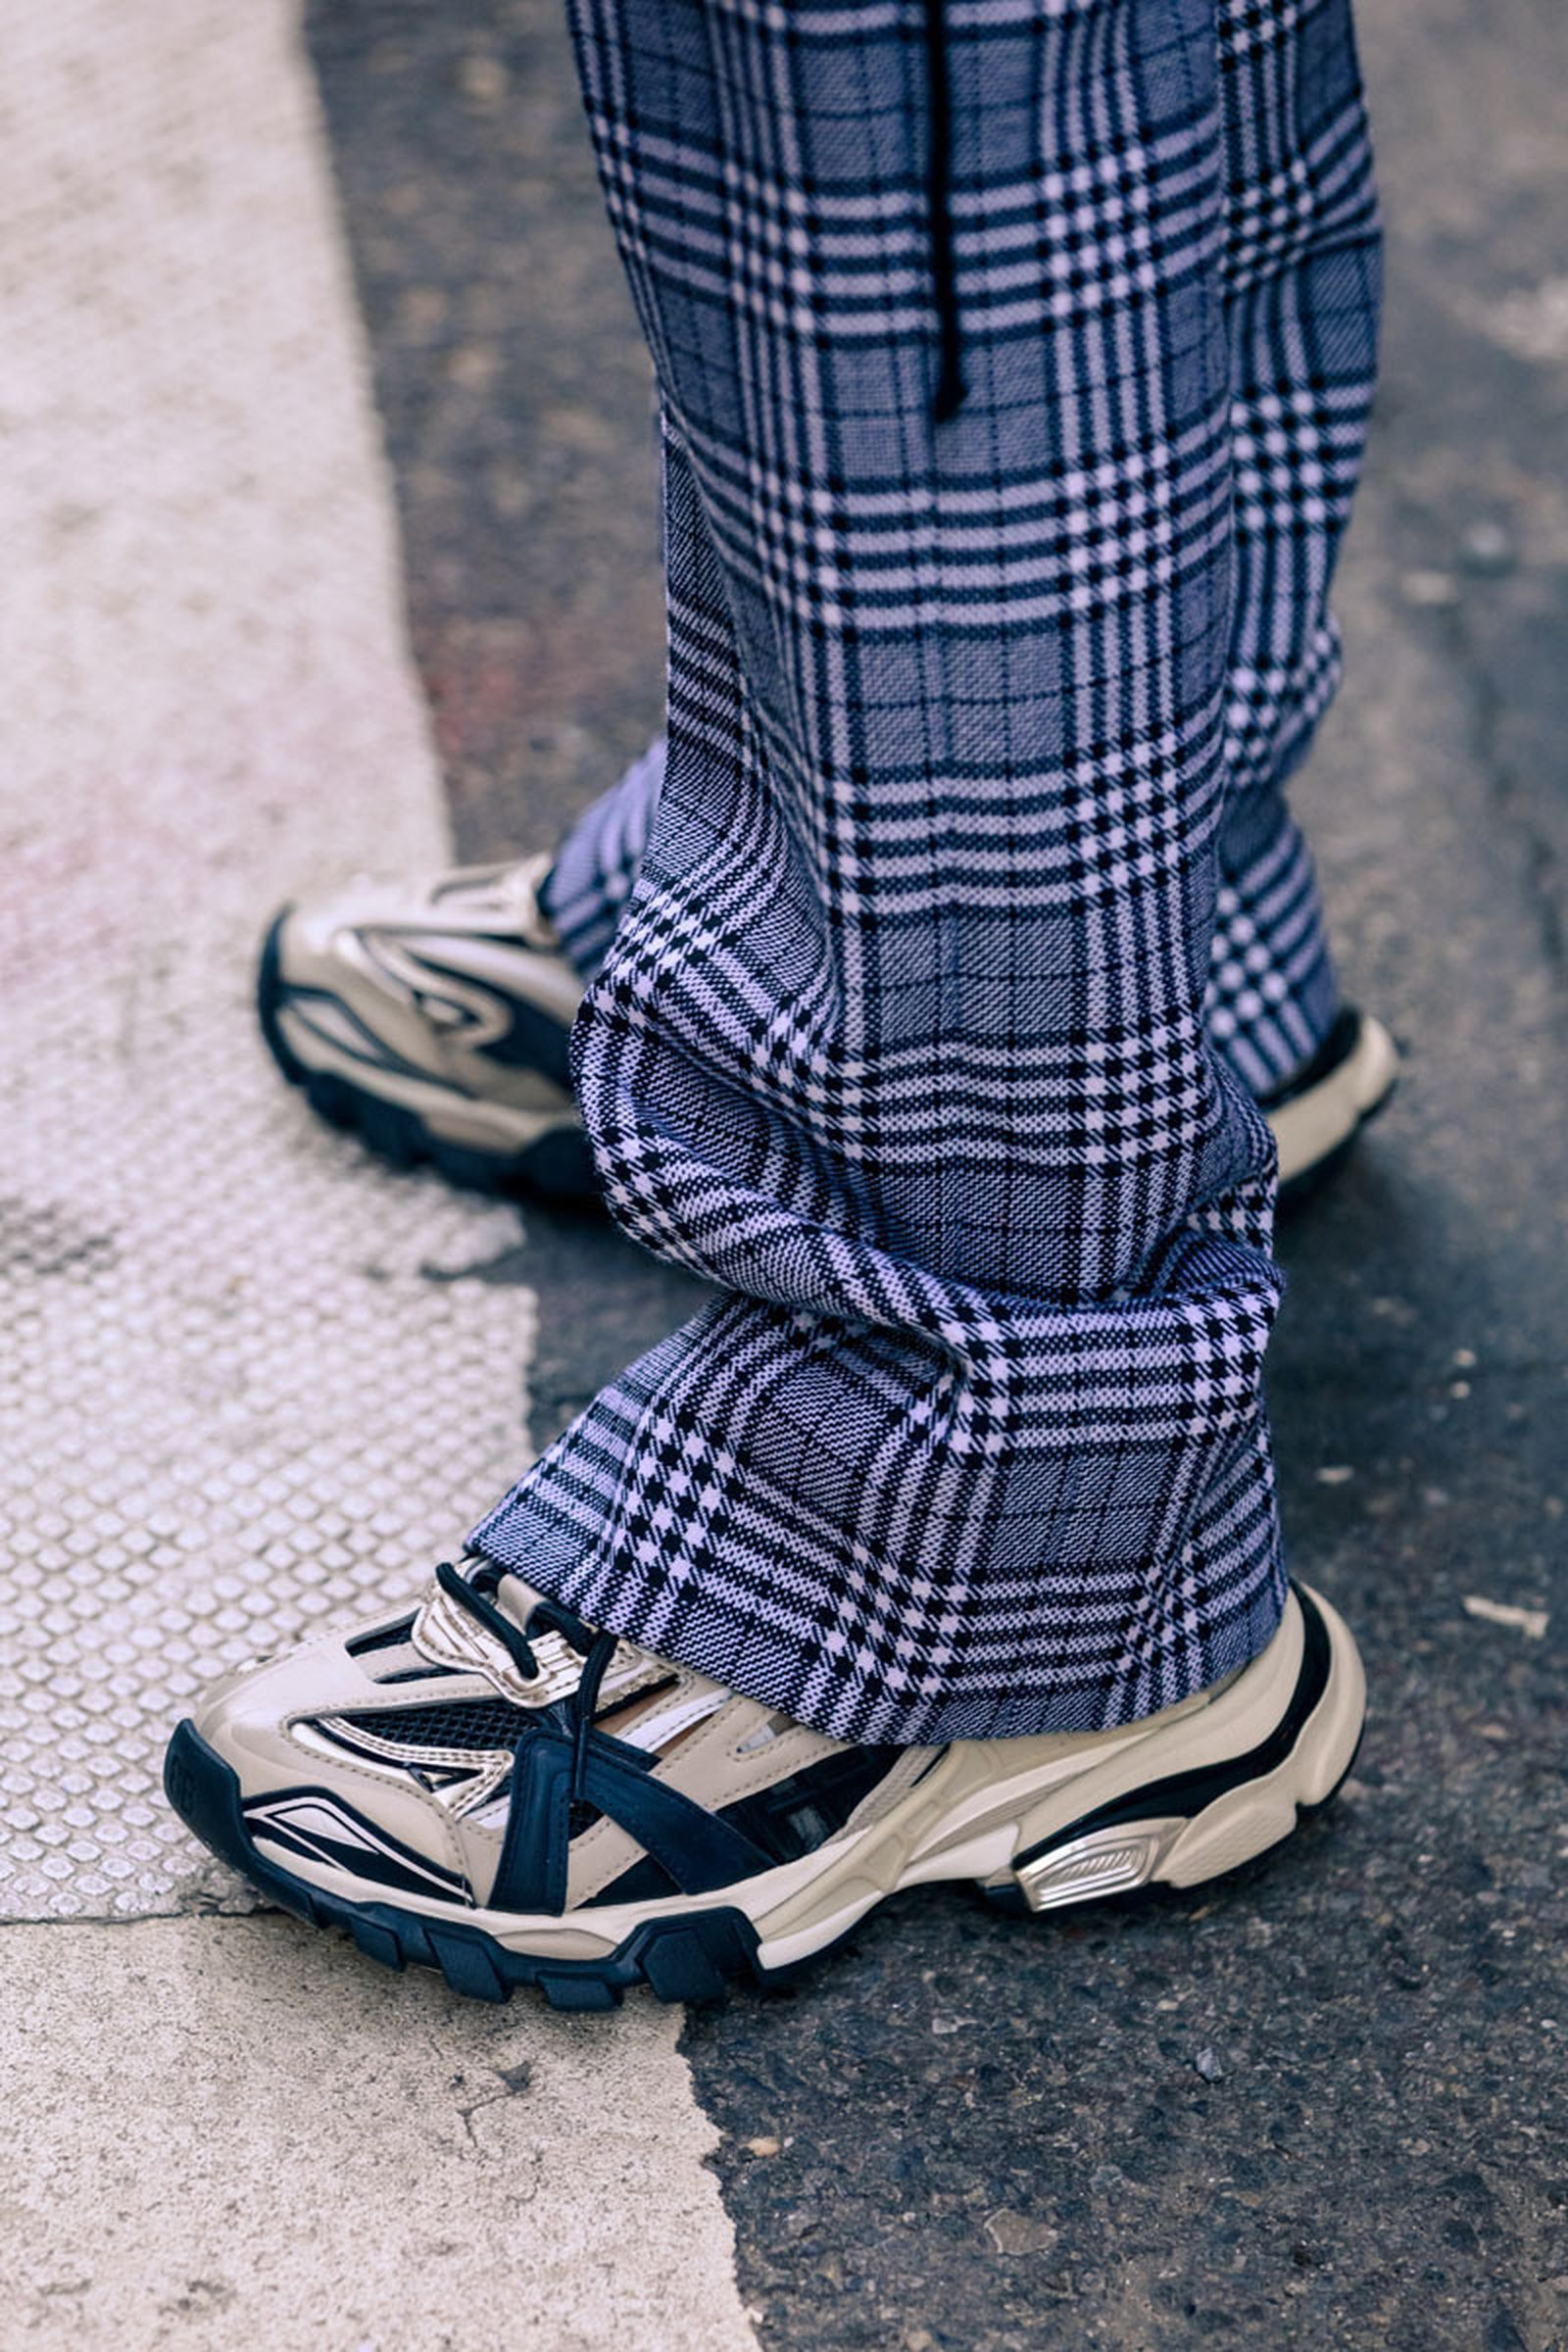 new-york-fashion-week-mens-fw20-sneaker-street-style-13